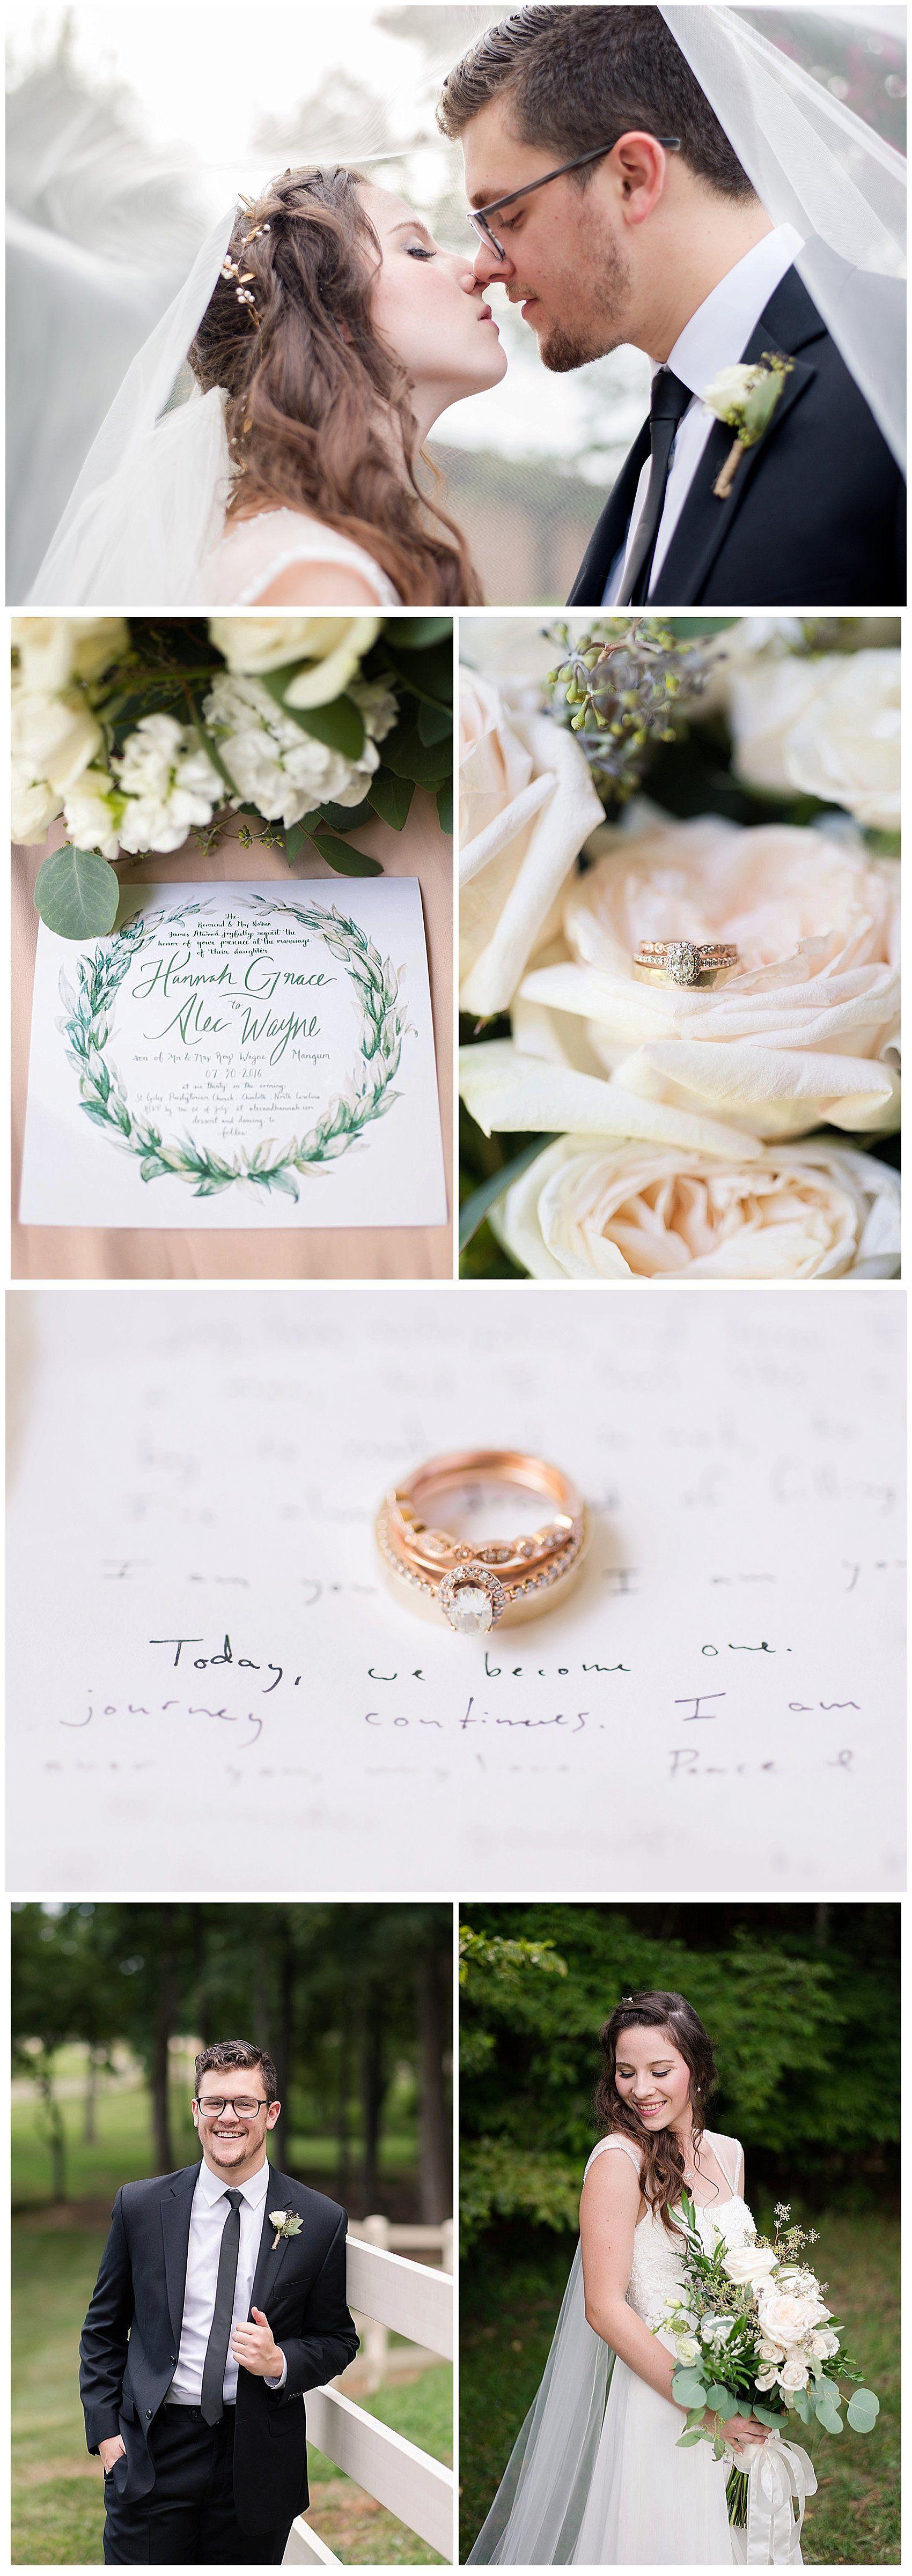 Hannah & Alec | Blush pink, Wedding and Wedding